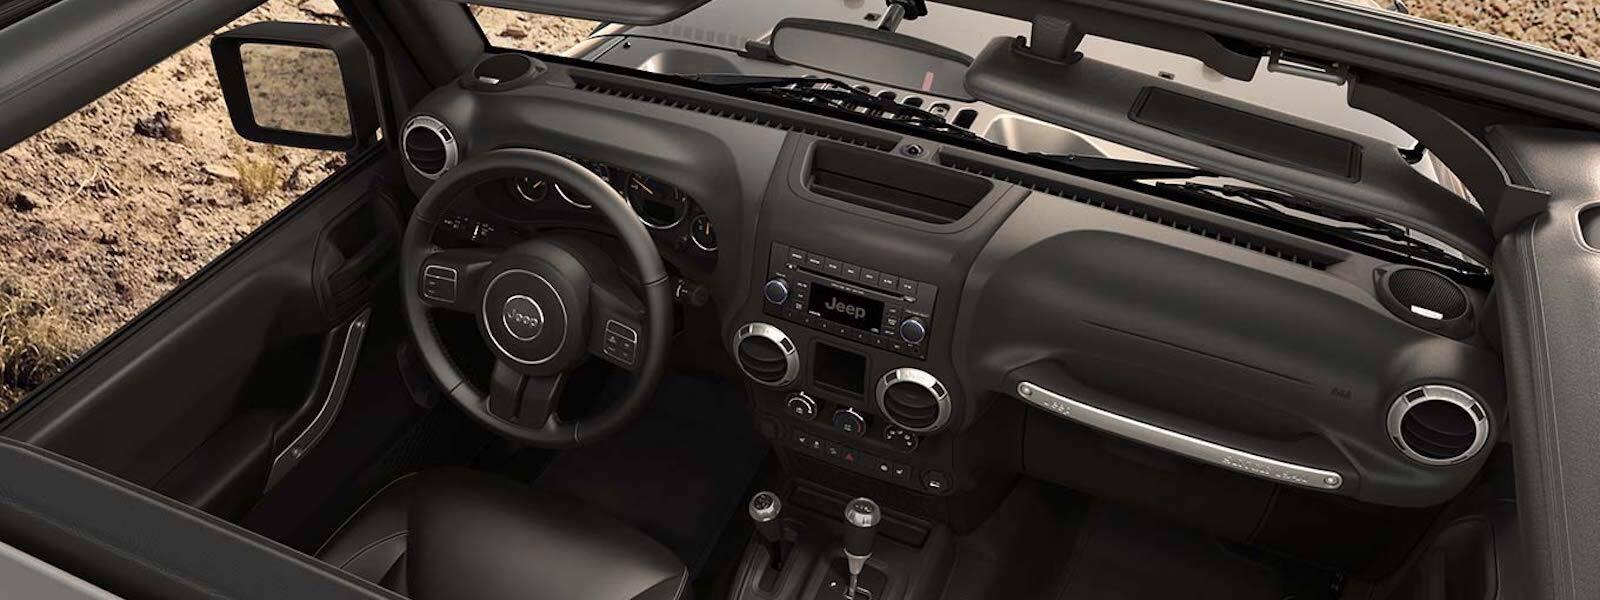 2016 Jeep Wrangler Technology